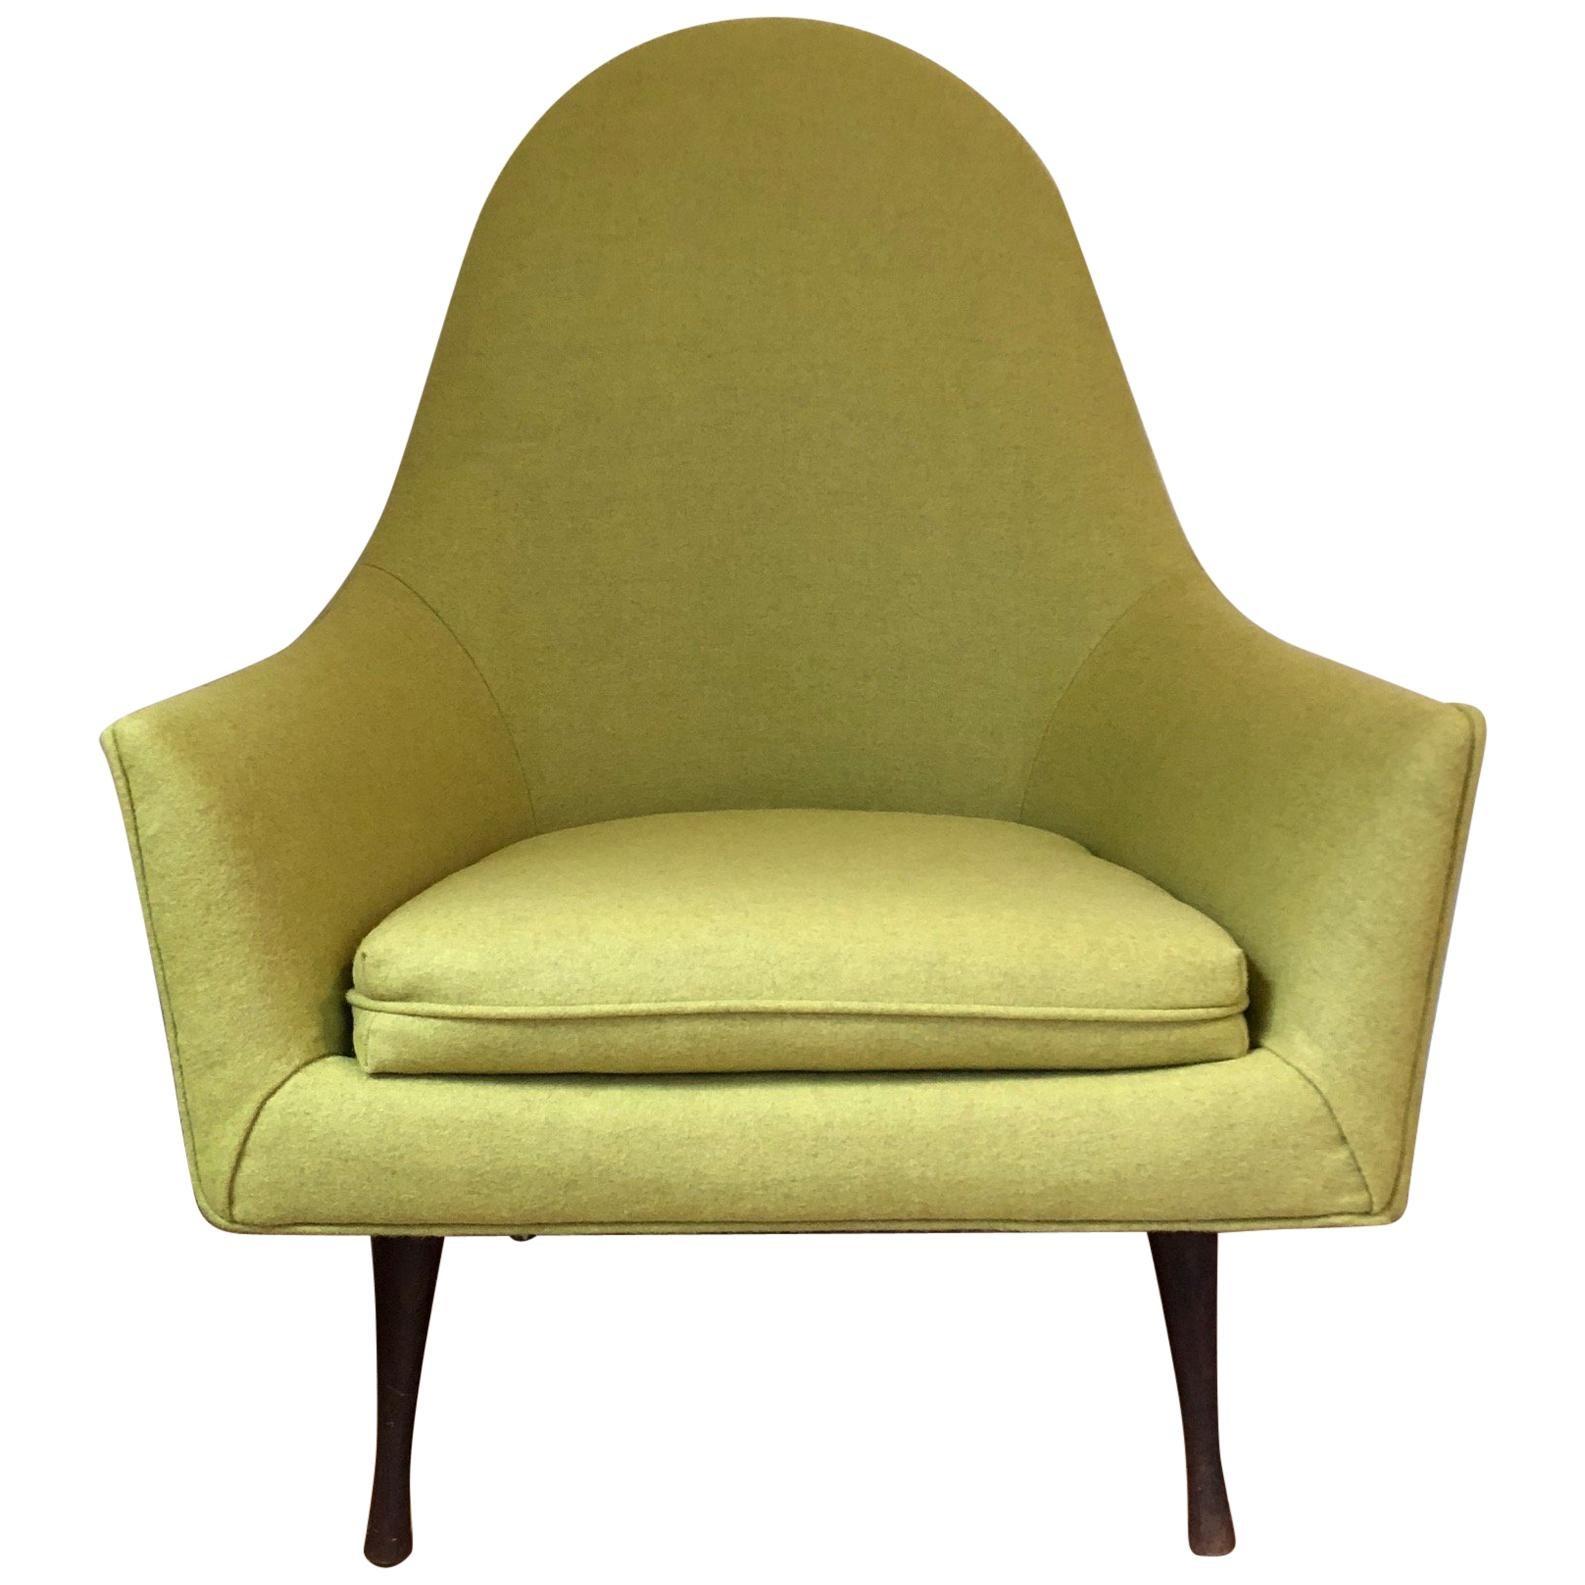 Paul McCobb for Widdicomb High Back Chair